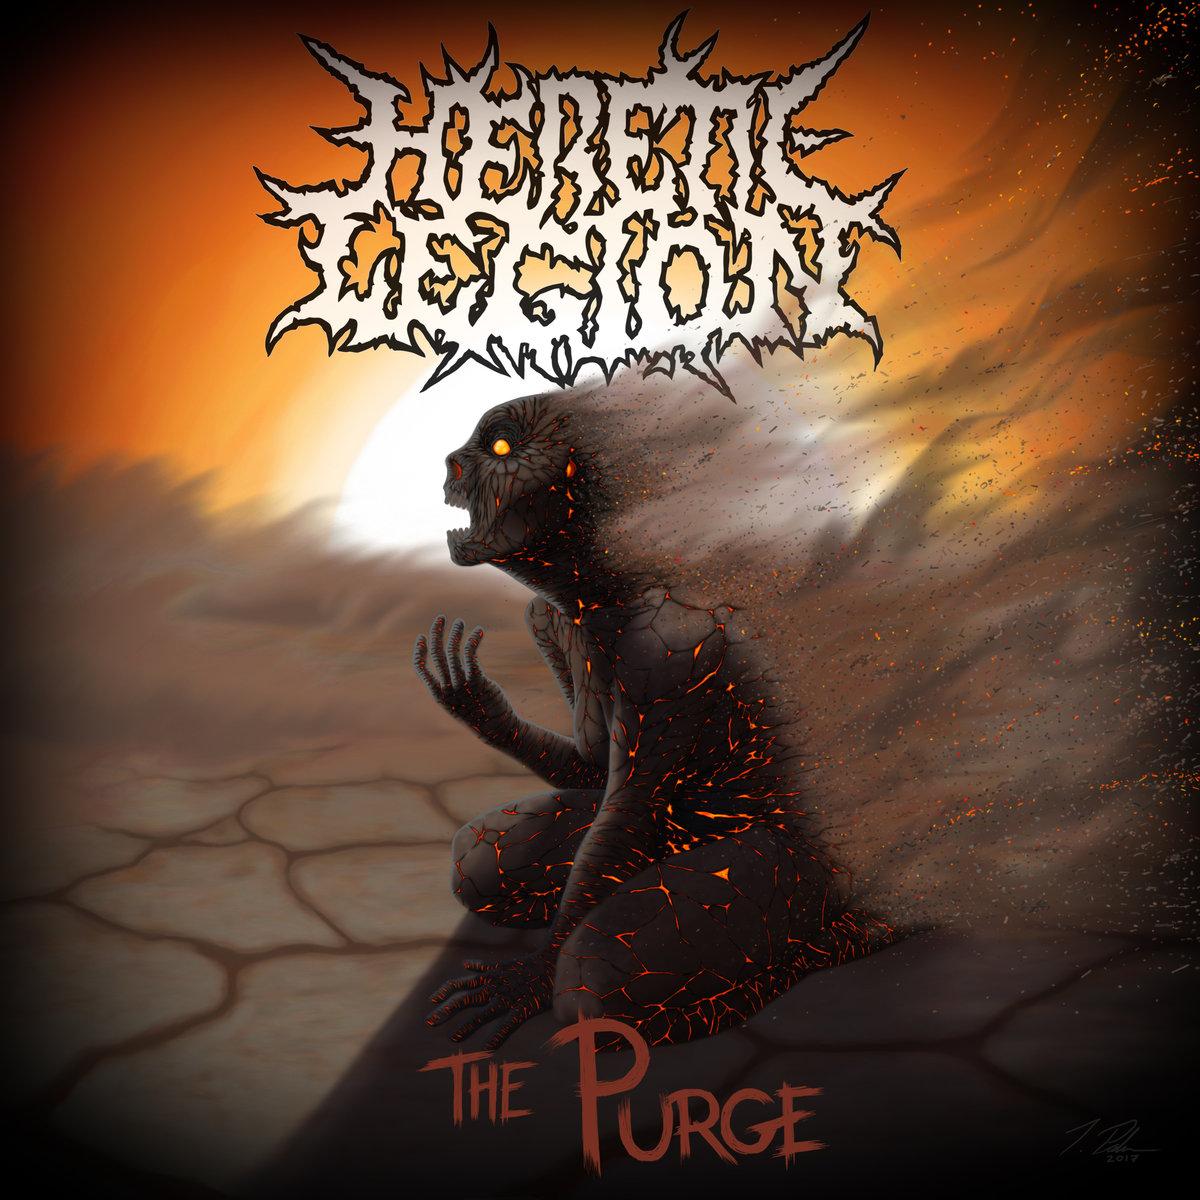 Дебютный альбом Heretic Legion